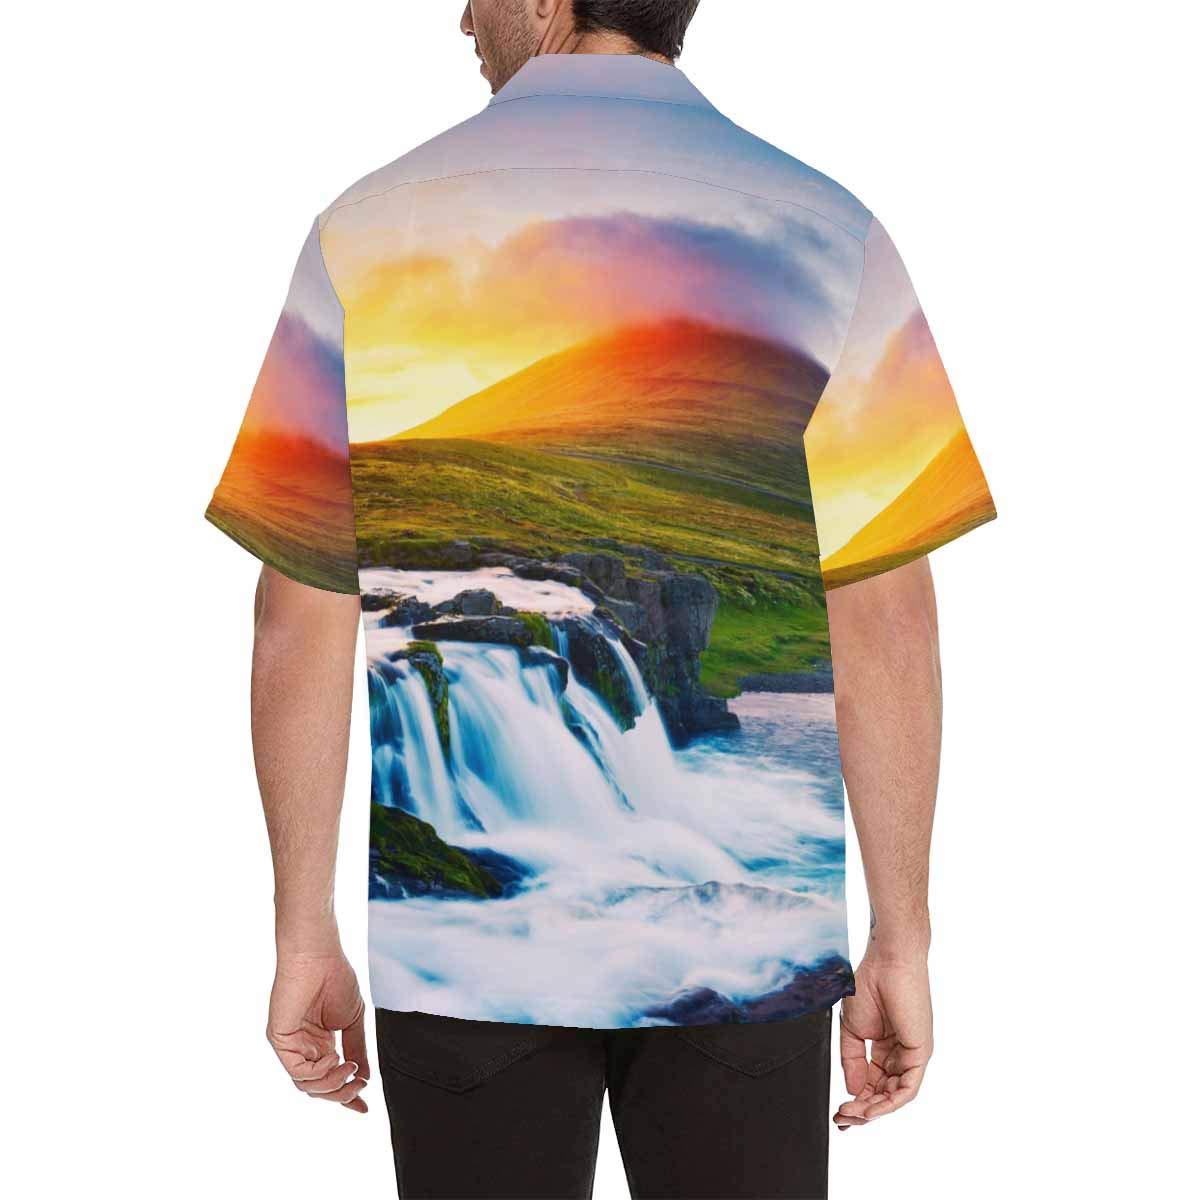 InterestPrint Sunset Waterfall Short Sleeve Shirts